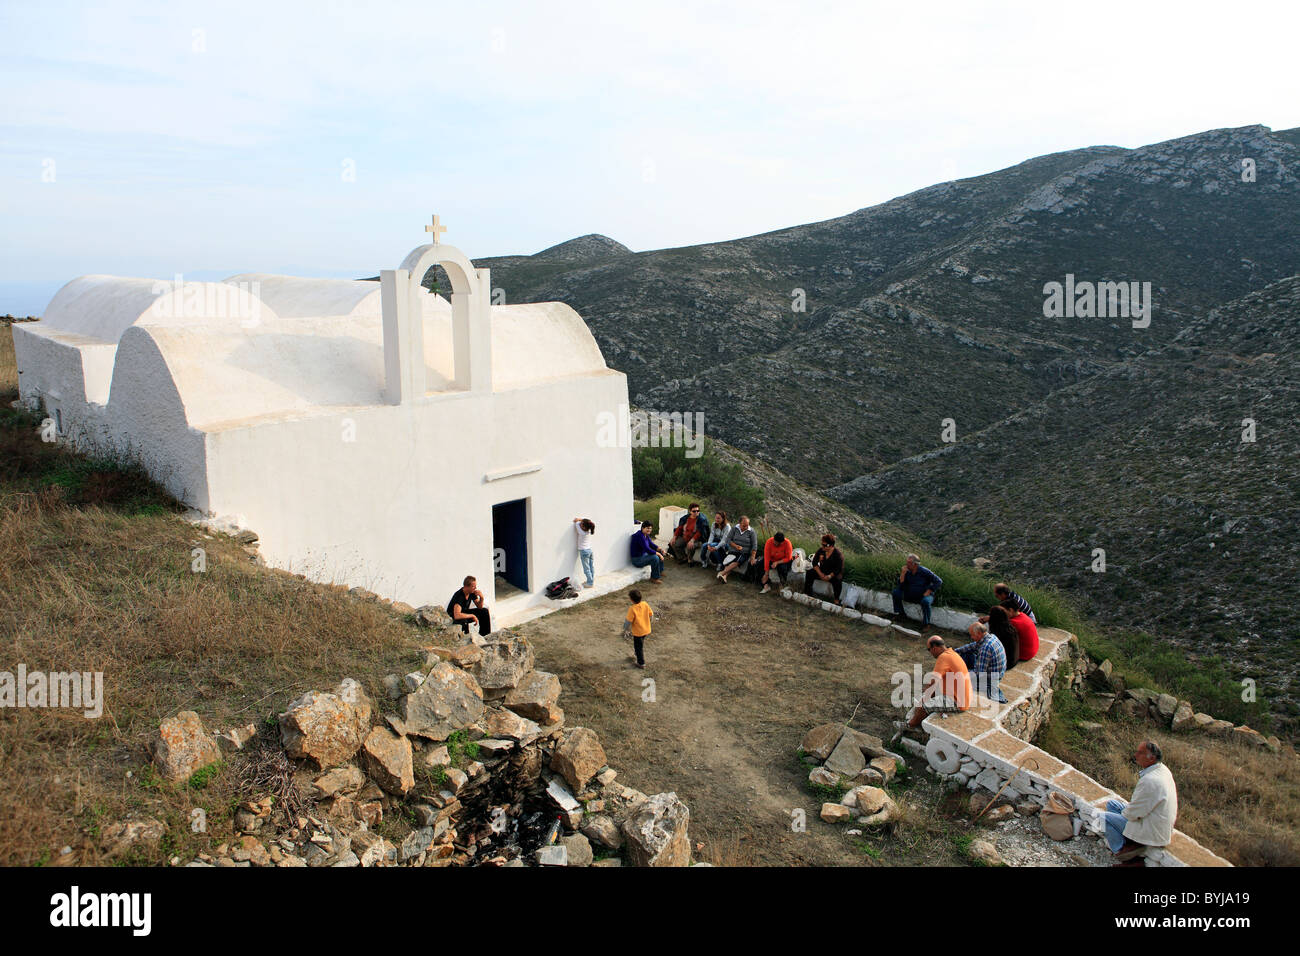 greece cyclades sikinos a religious festival at agios dimitrios church - Stock Image